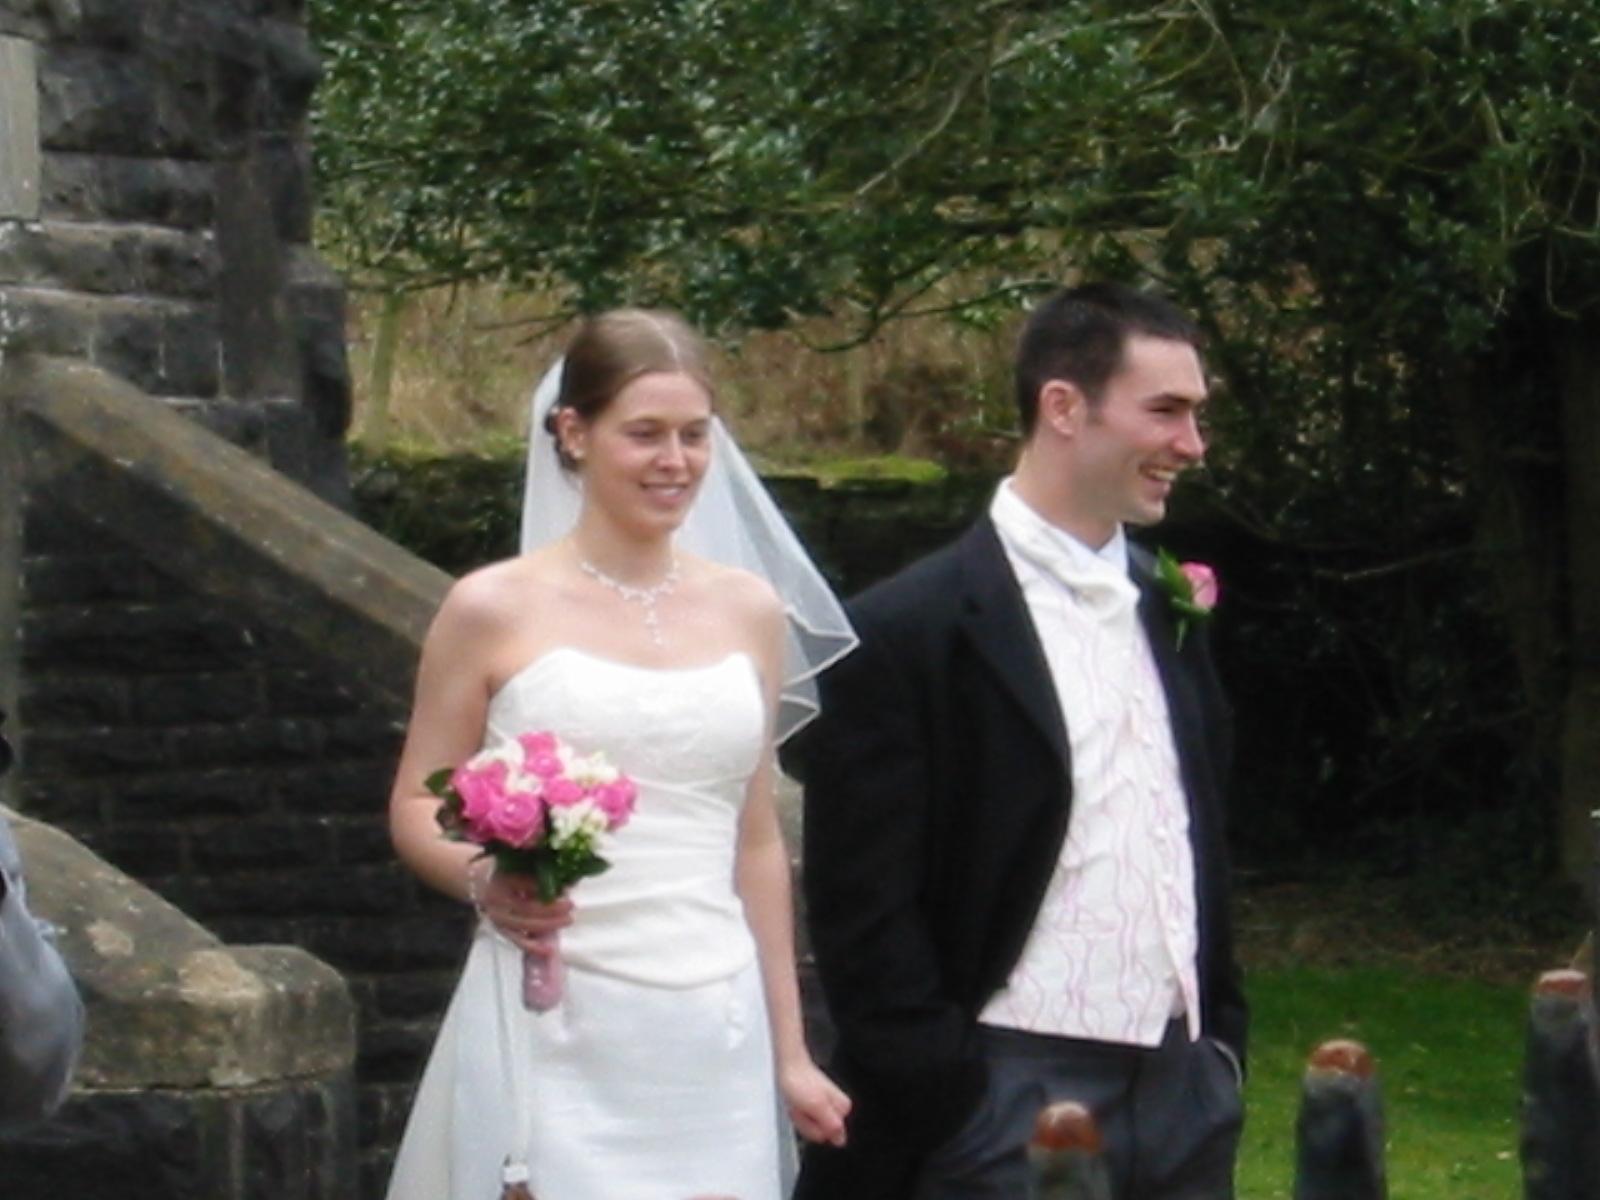 Kathryn and Ian